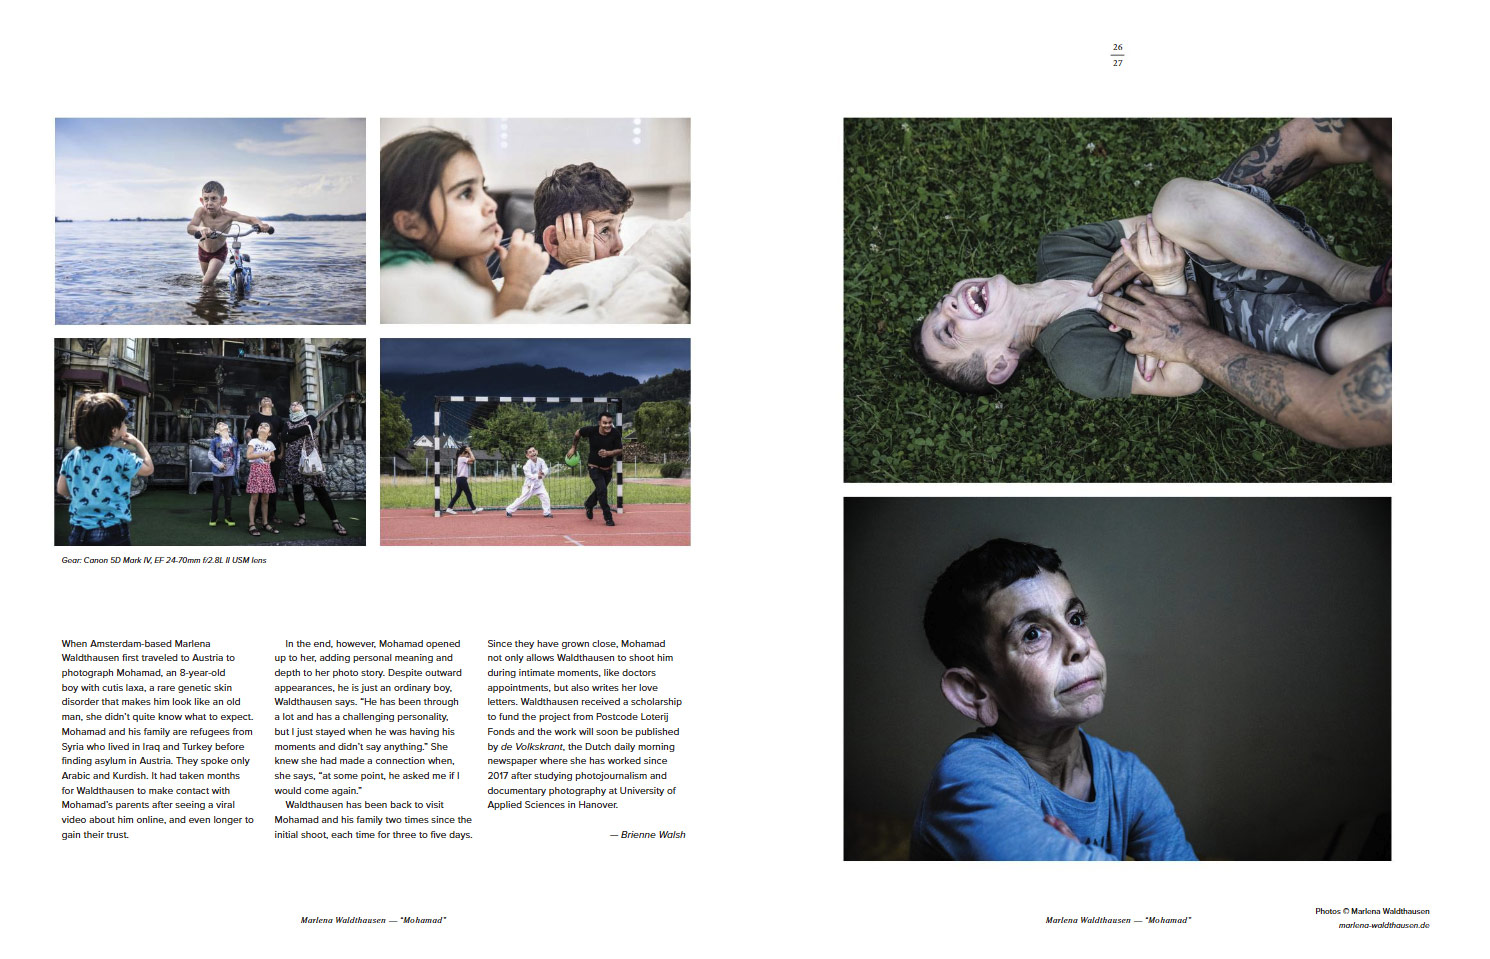 Мохамад © Марлена Вальдтхаузен, Фотоконкурс «Начинающий фотограф» — Emerging Photographer